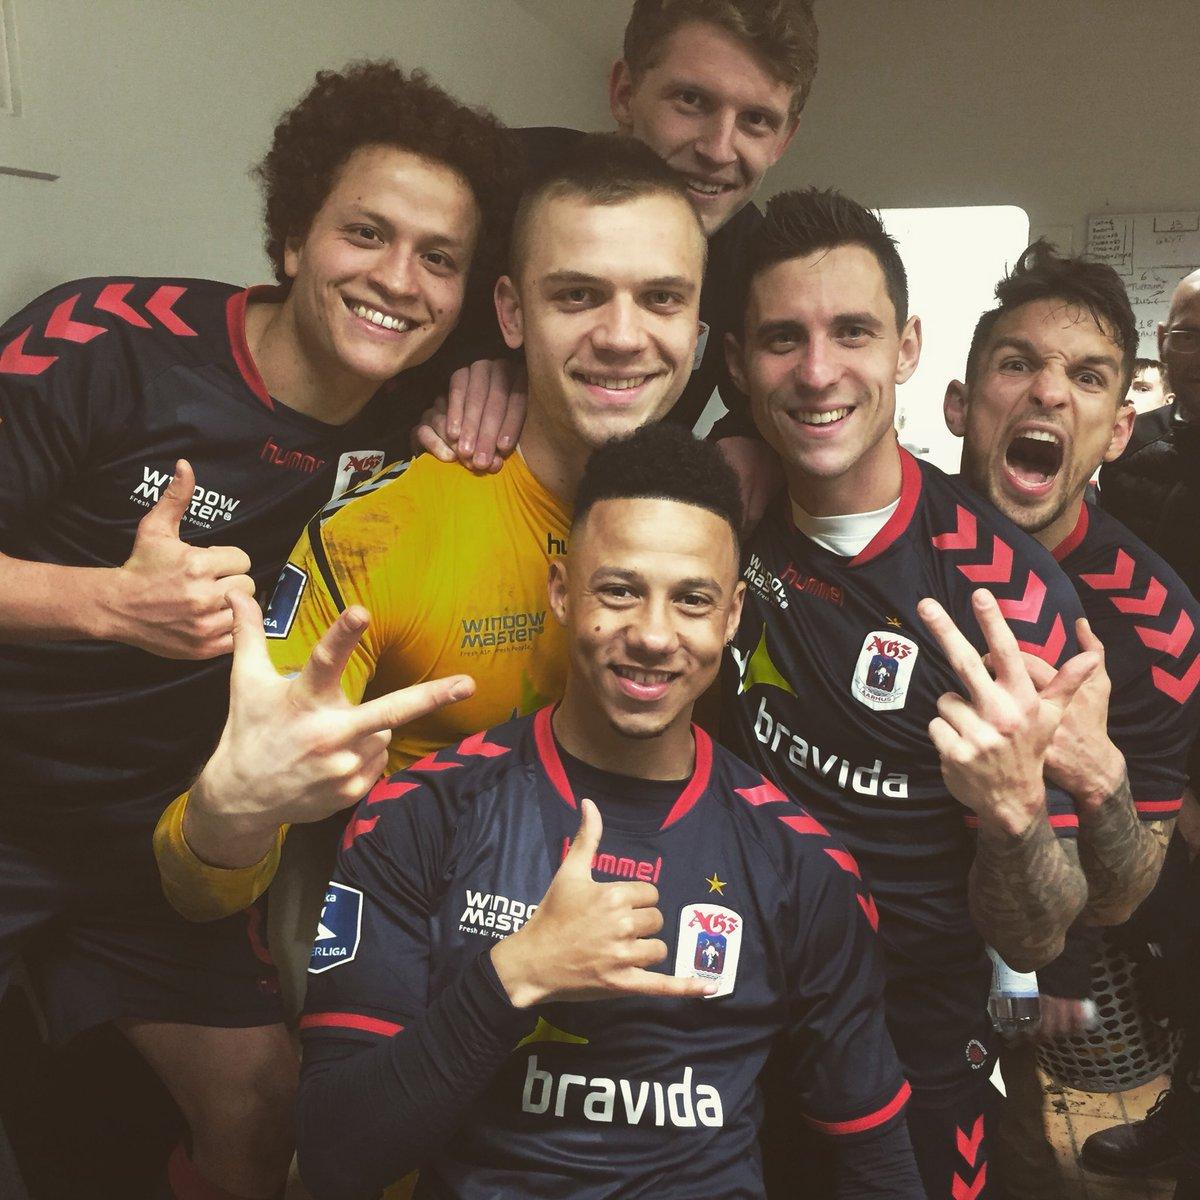 3 point!!  #ultratwitteragf <br>http://pic.twitter.com/jpjGGaOaJH